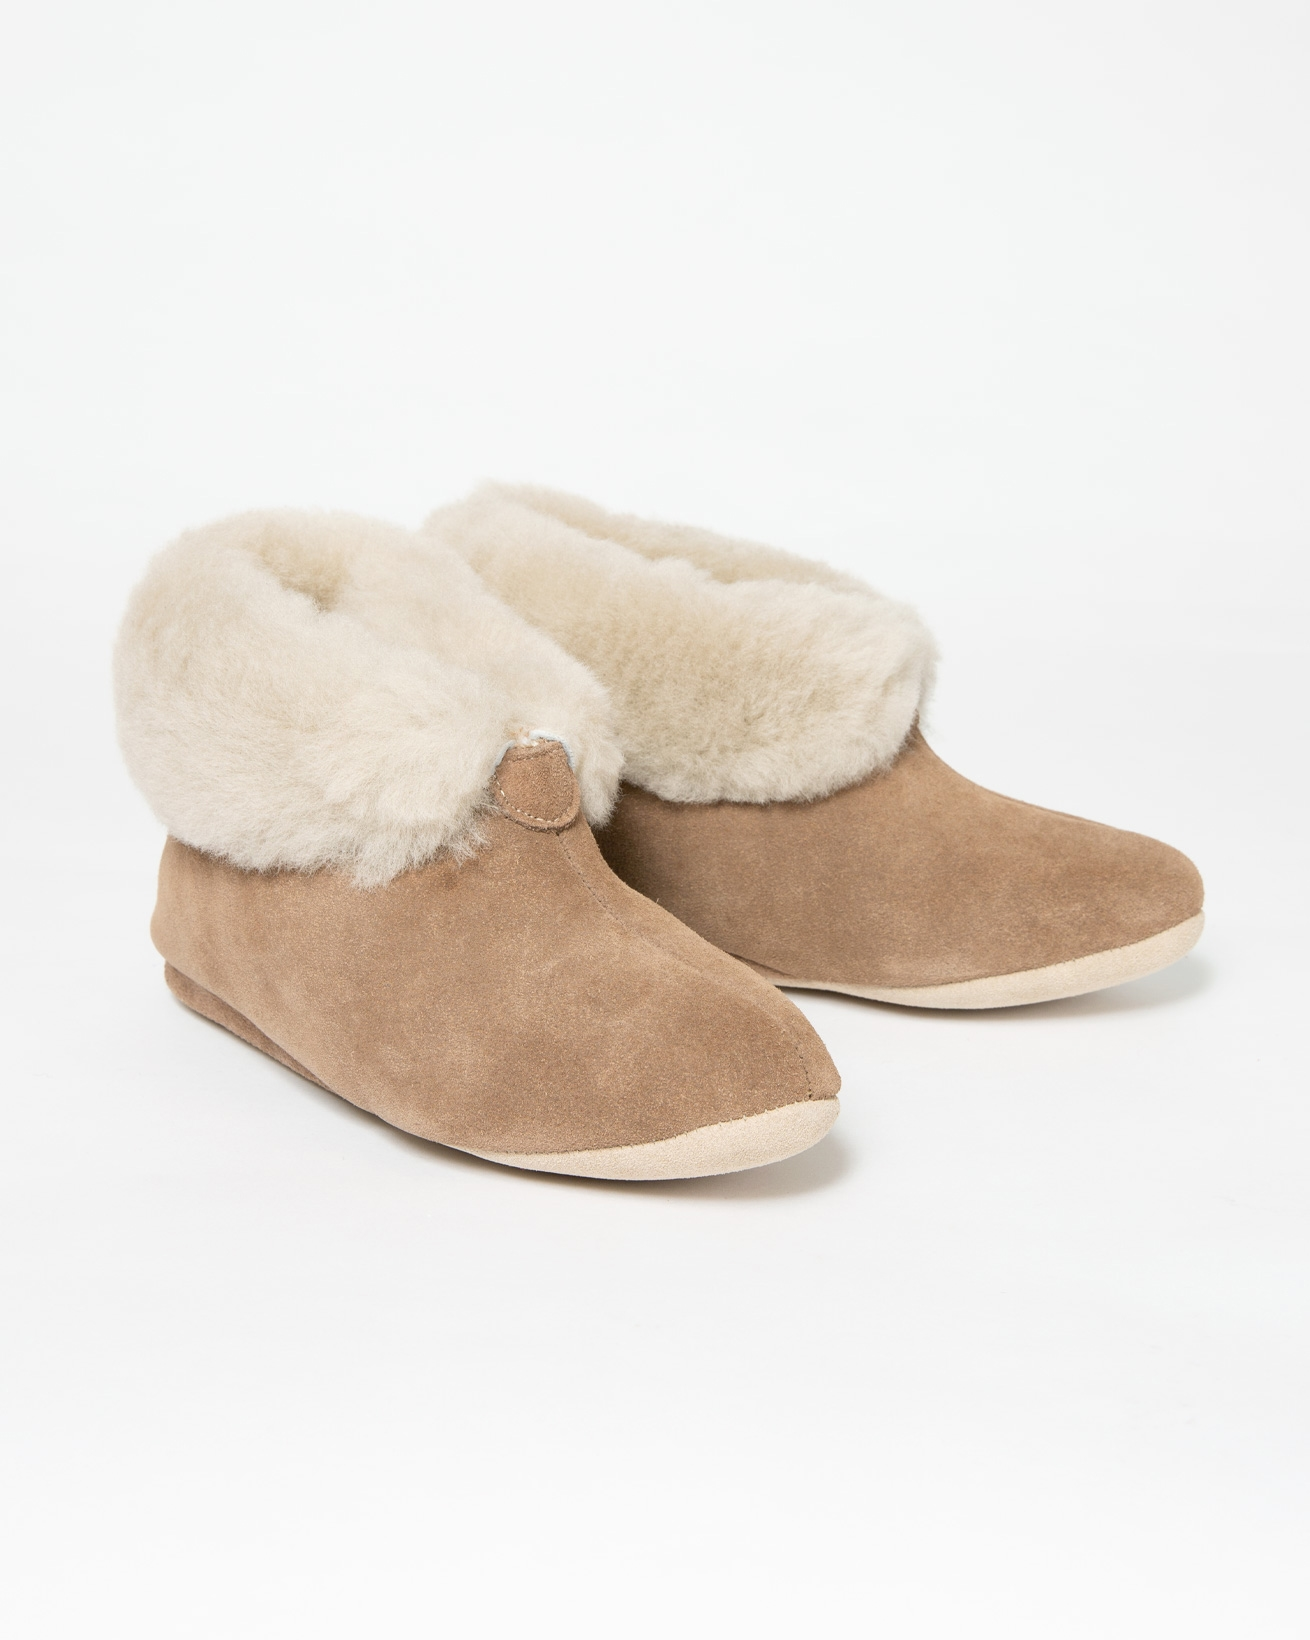 Ladies Igloo Slipper - Size 3 - Mole